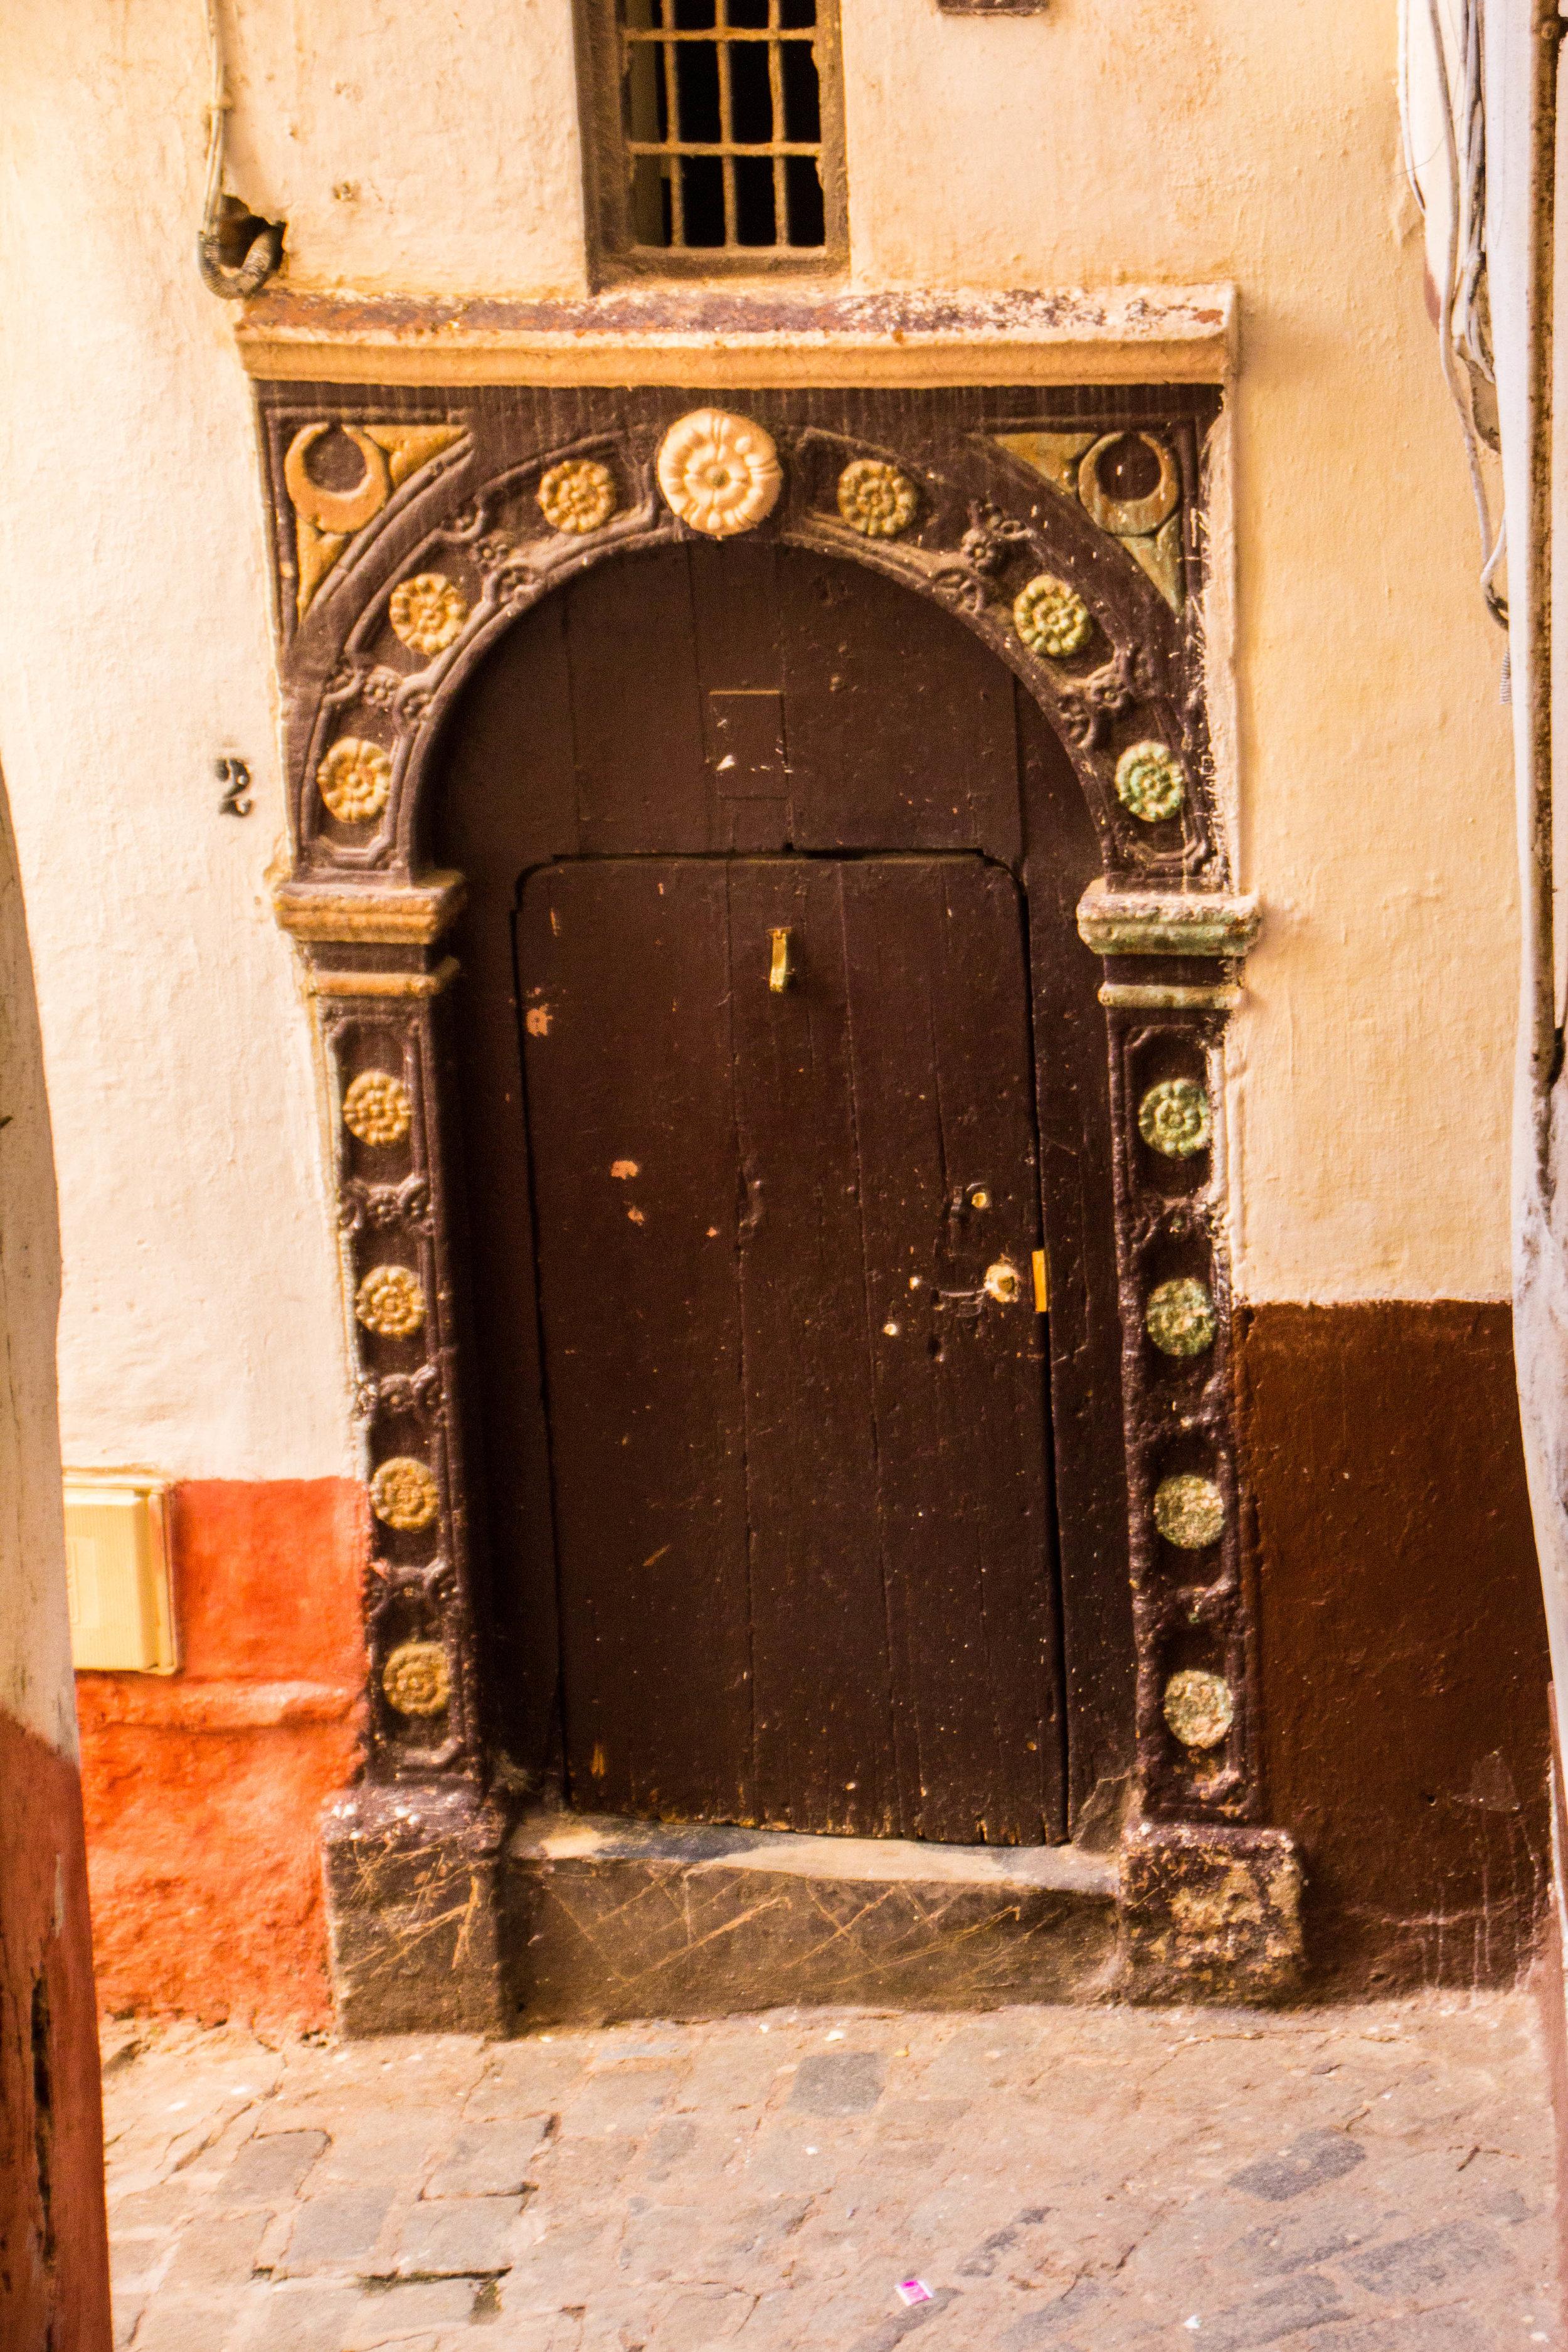 casbah-photography-algiers-algeria-alger-4.jpg